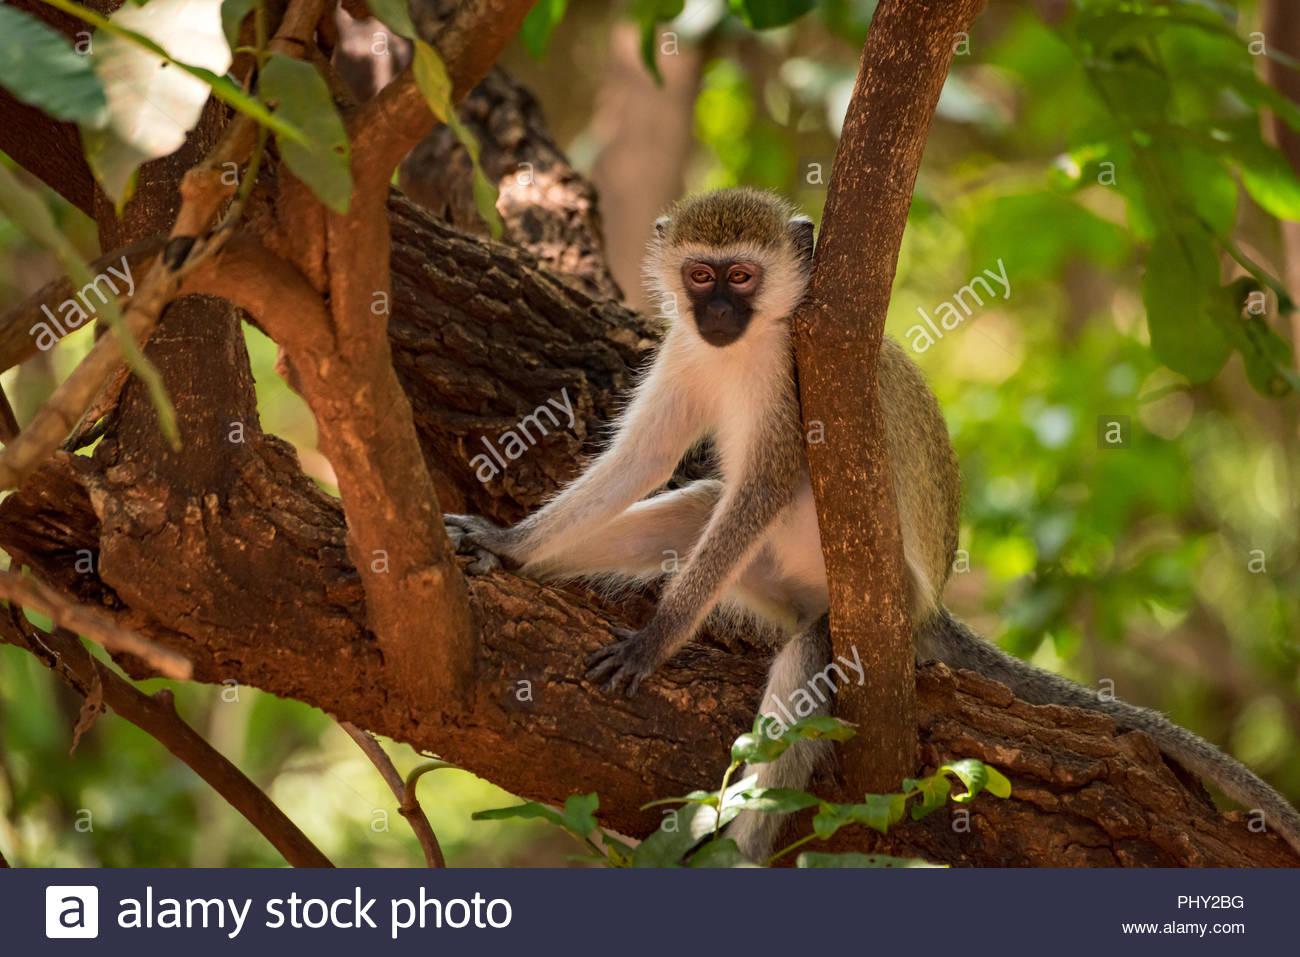 Vervet monkey sitting on branch in shade - Stock Photo